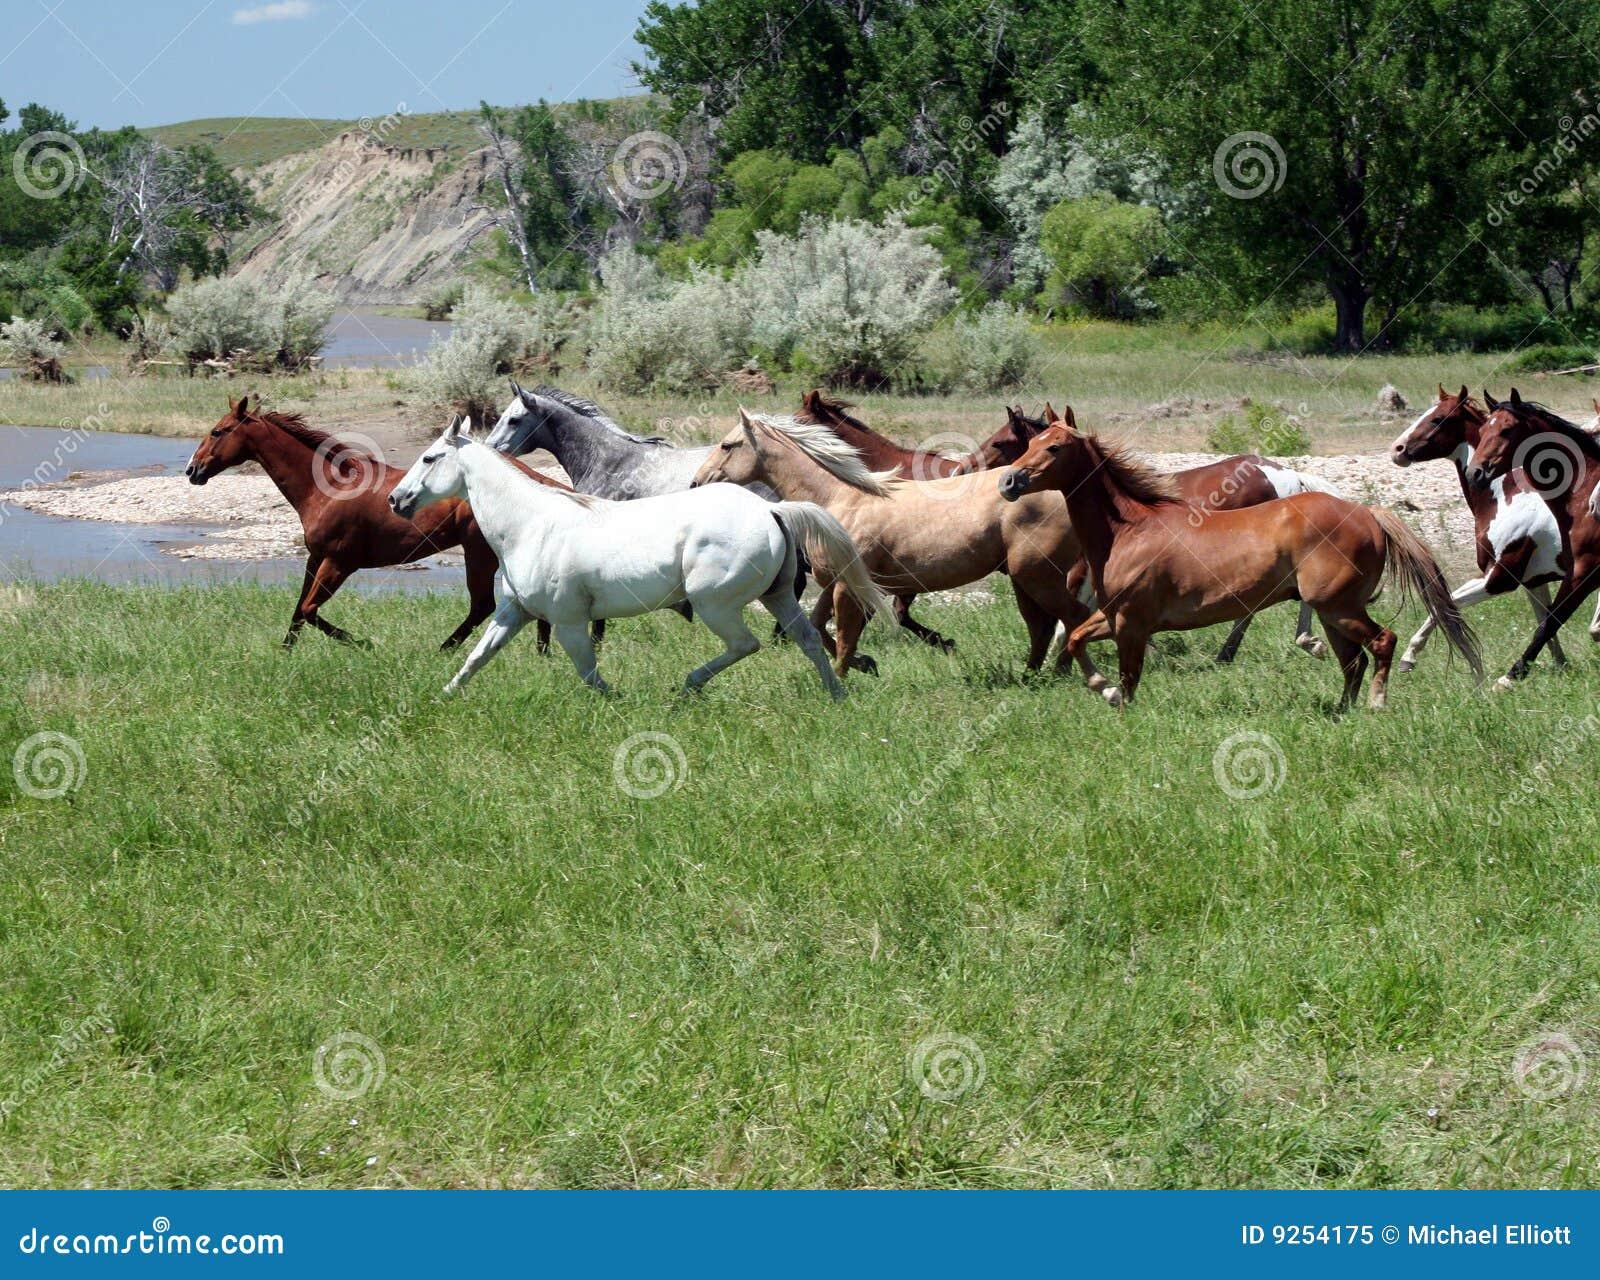 Horse herd galloping